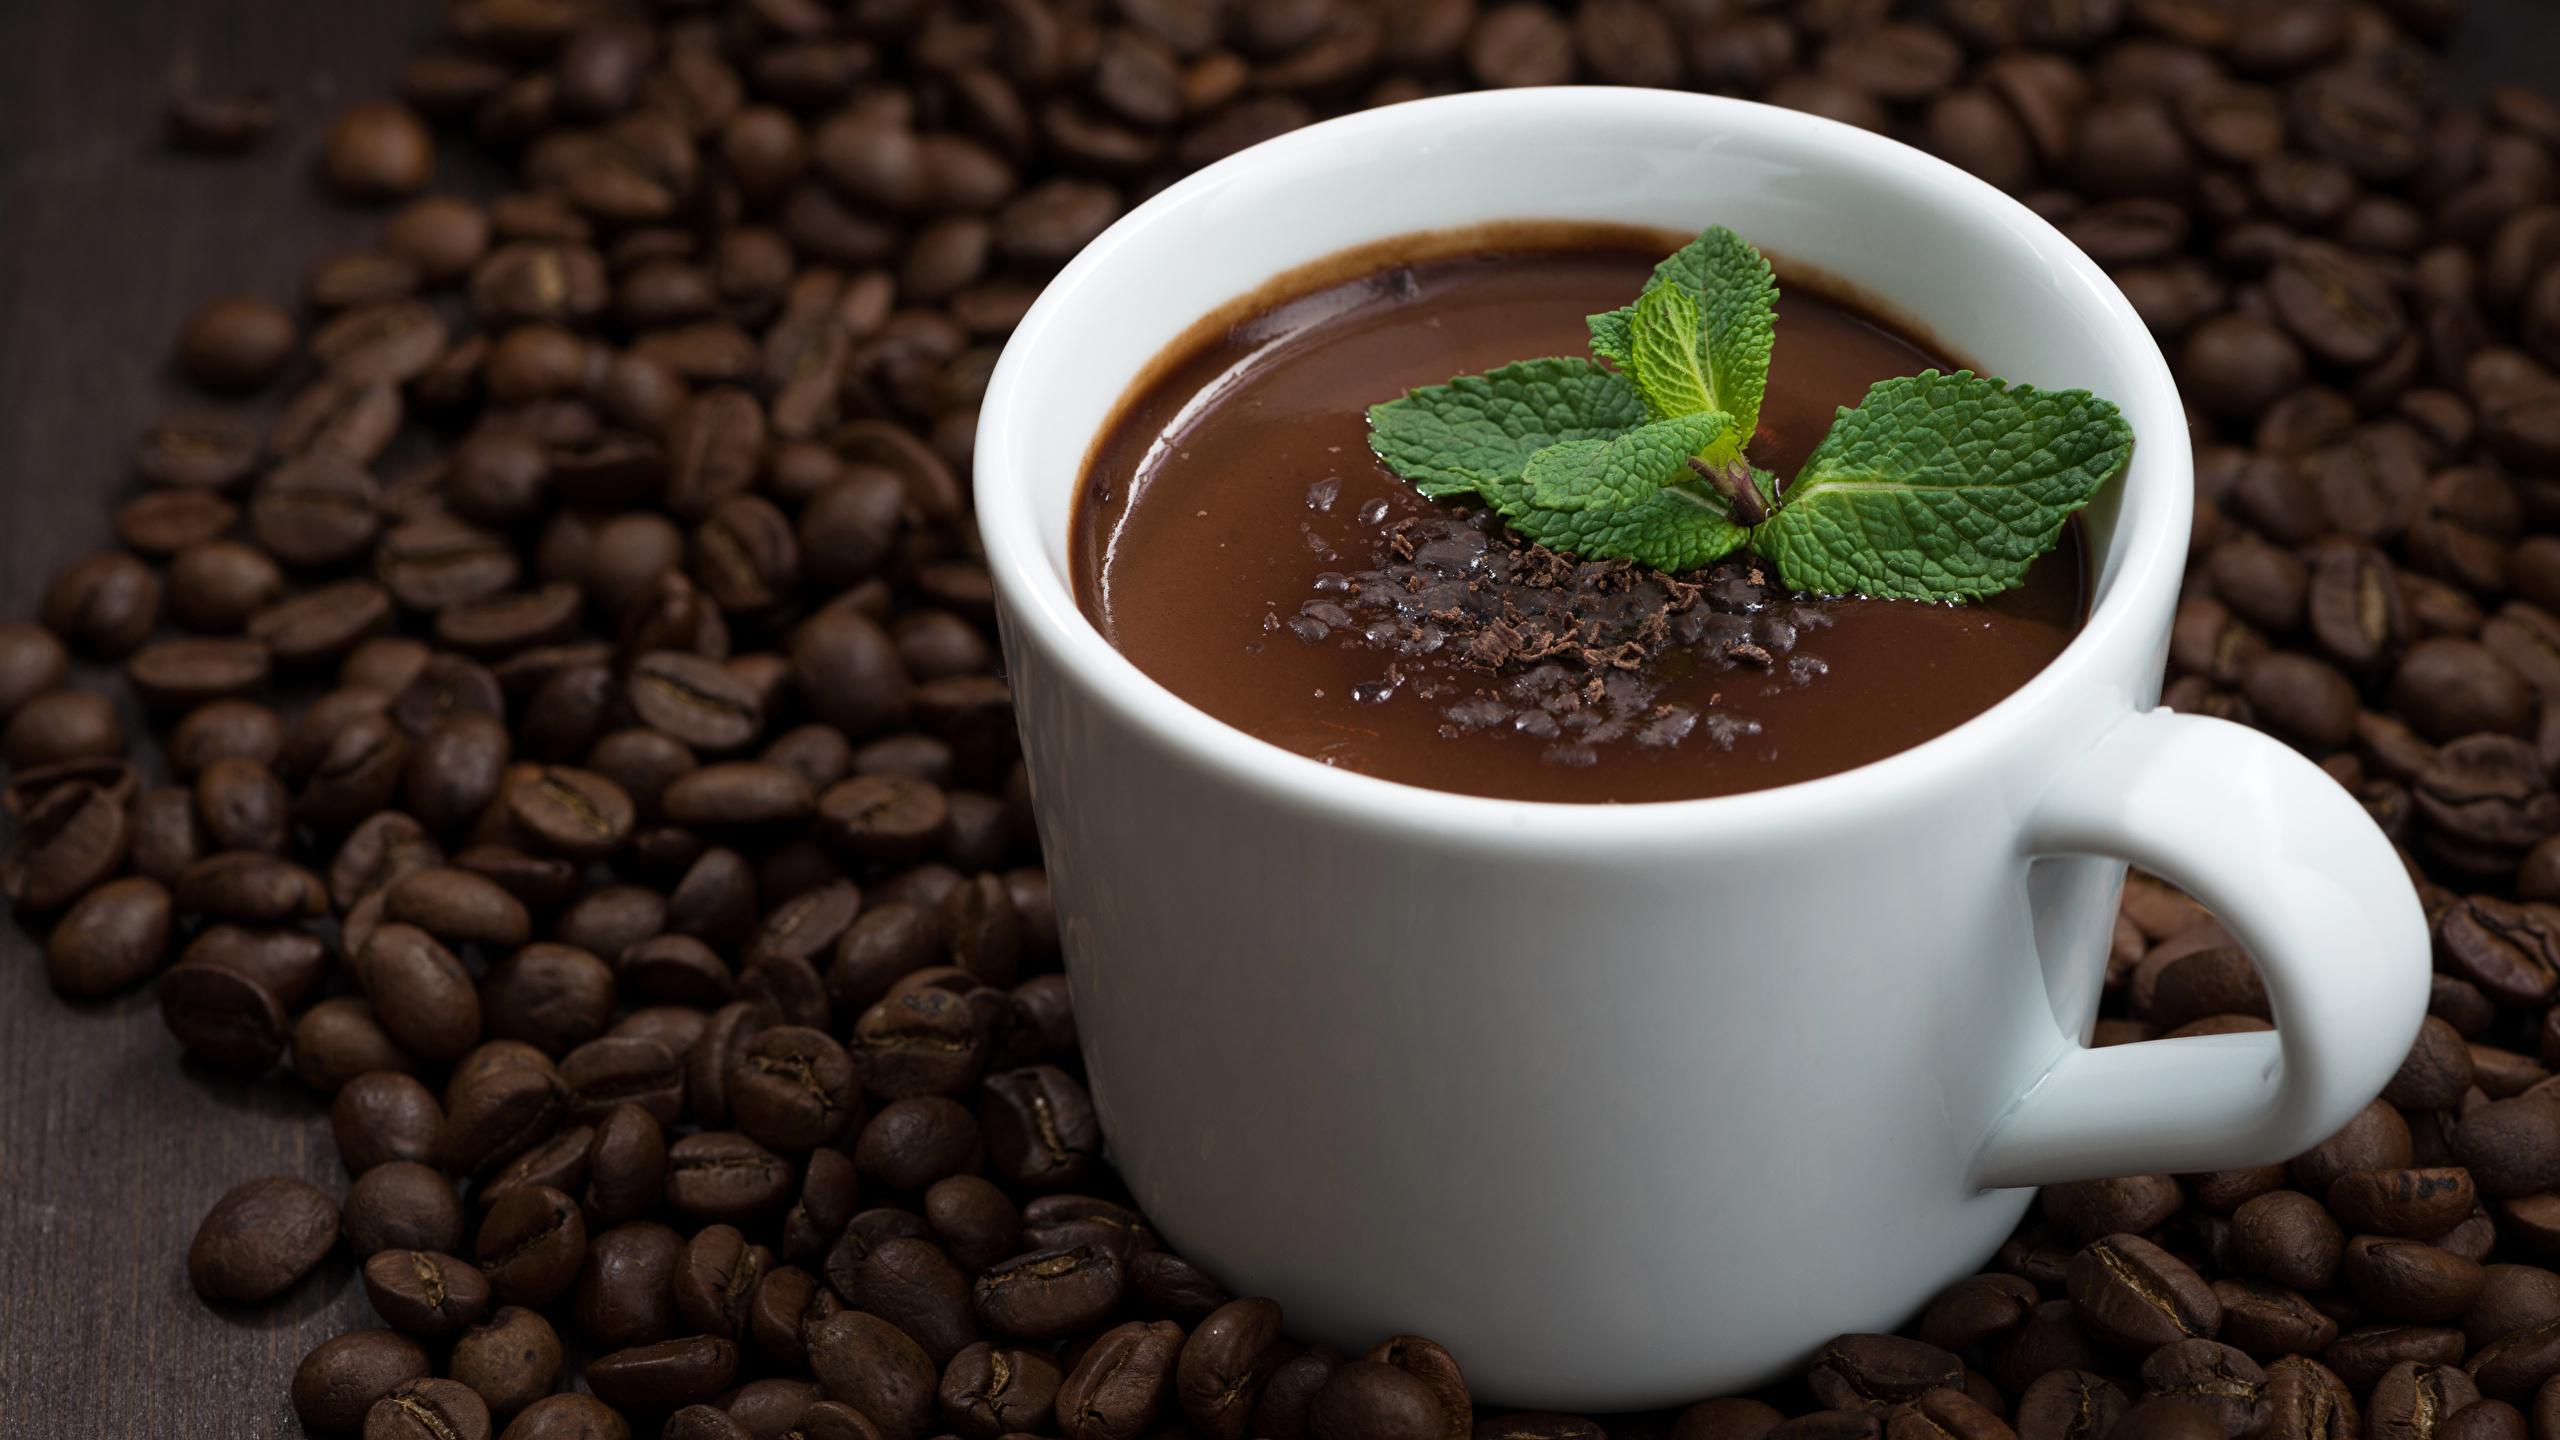 Фото чашки с кофе